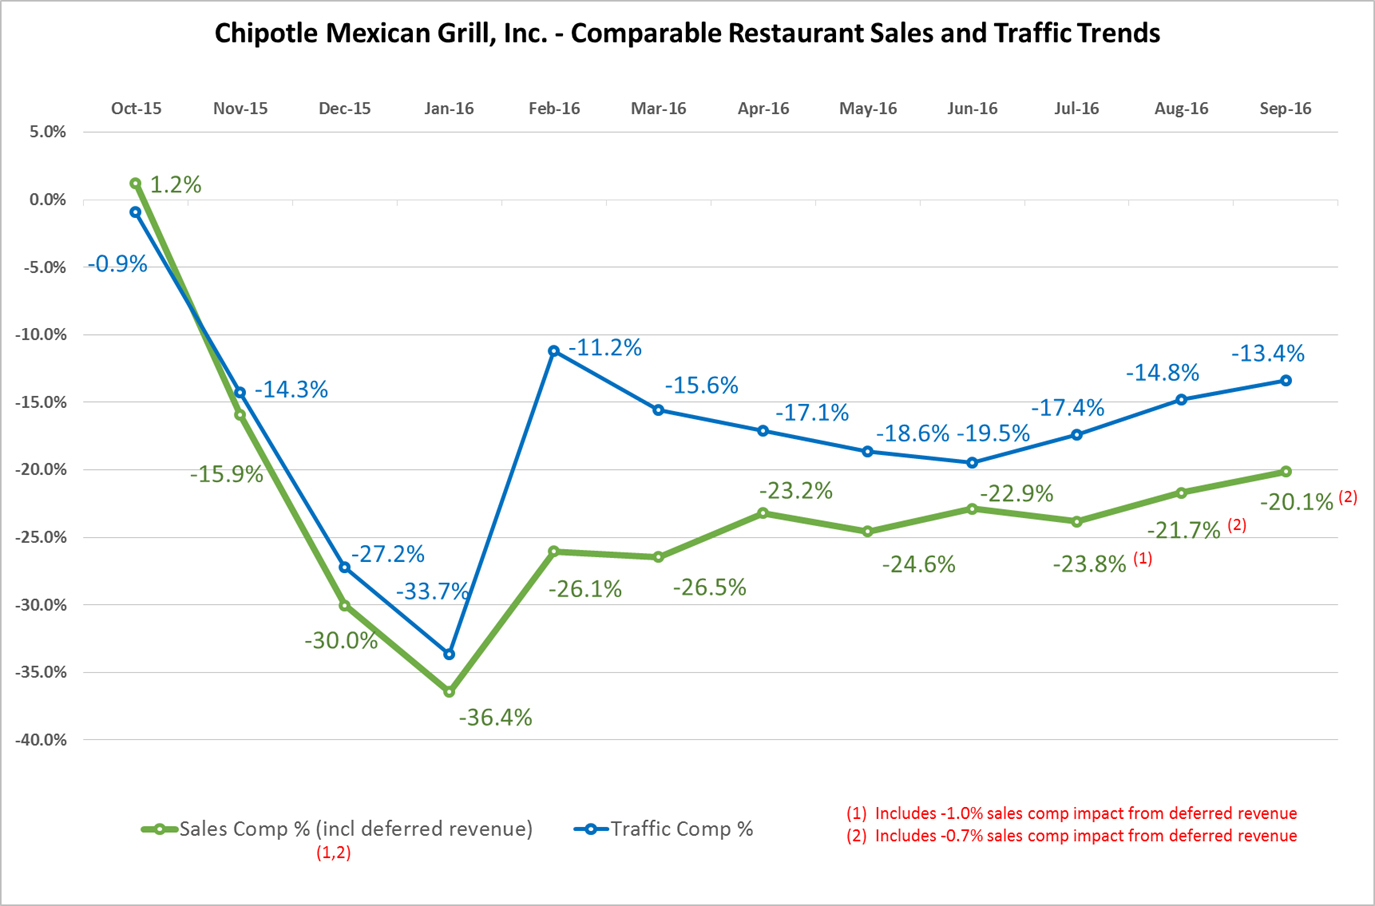 Chipotle Mexican Grill, Inc  Announces Third Quarter 2016